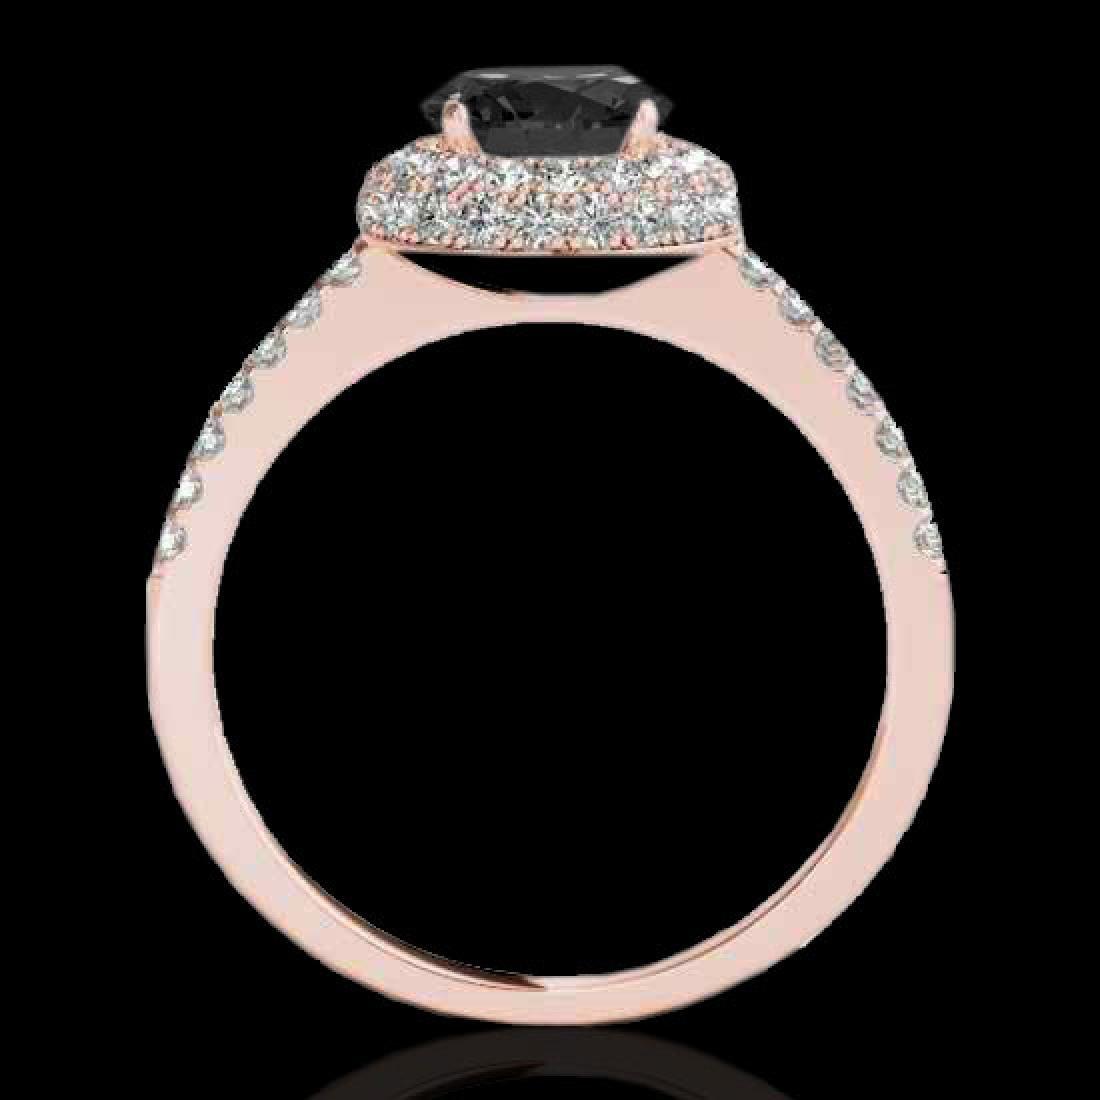 1.6 CTW Certified VS Black Diamond Solitaire Halo Ring - 2